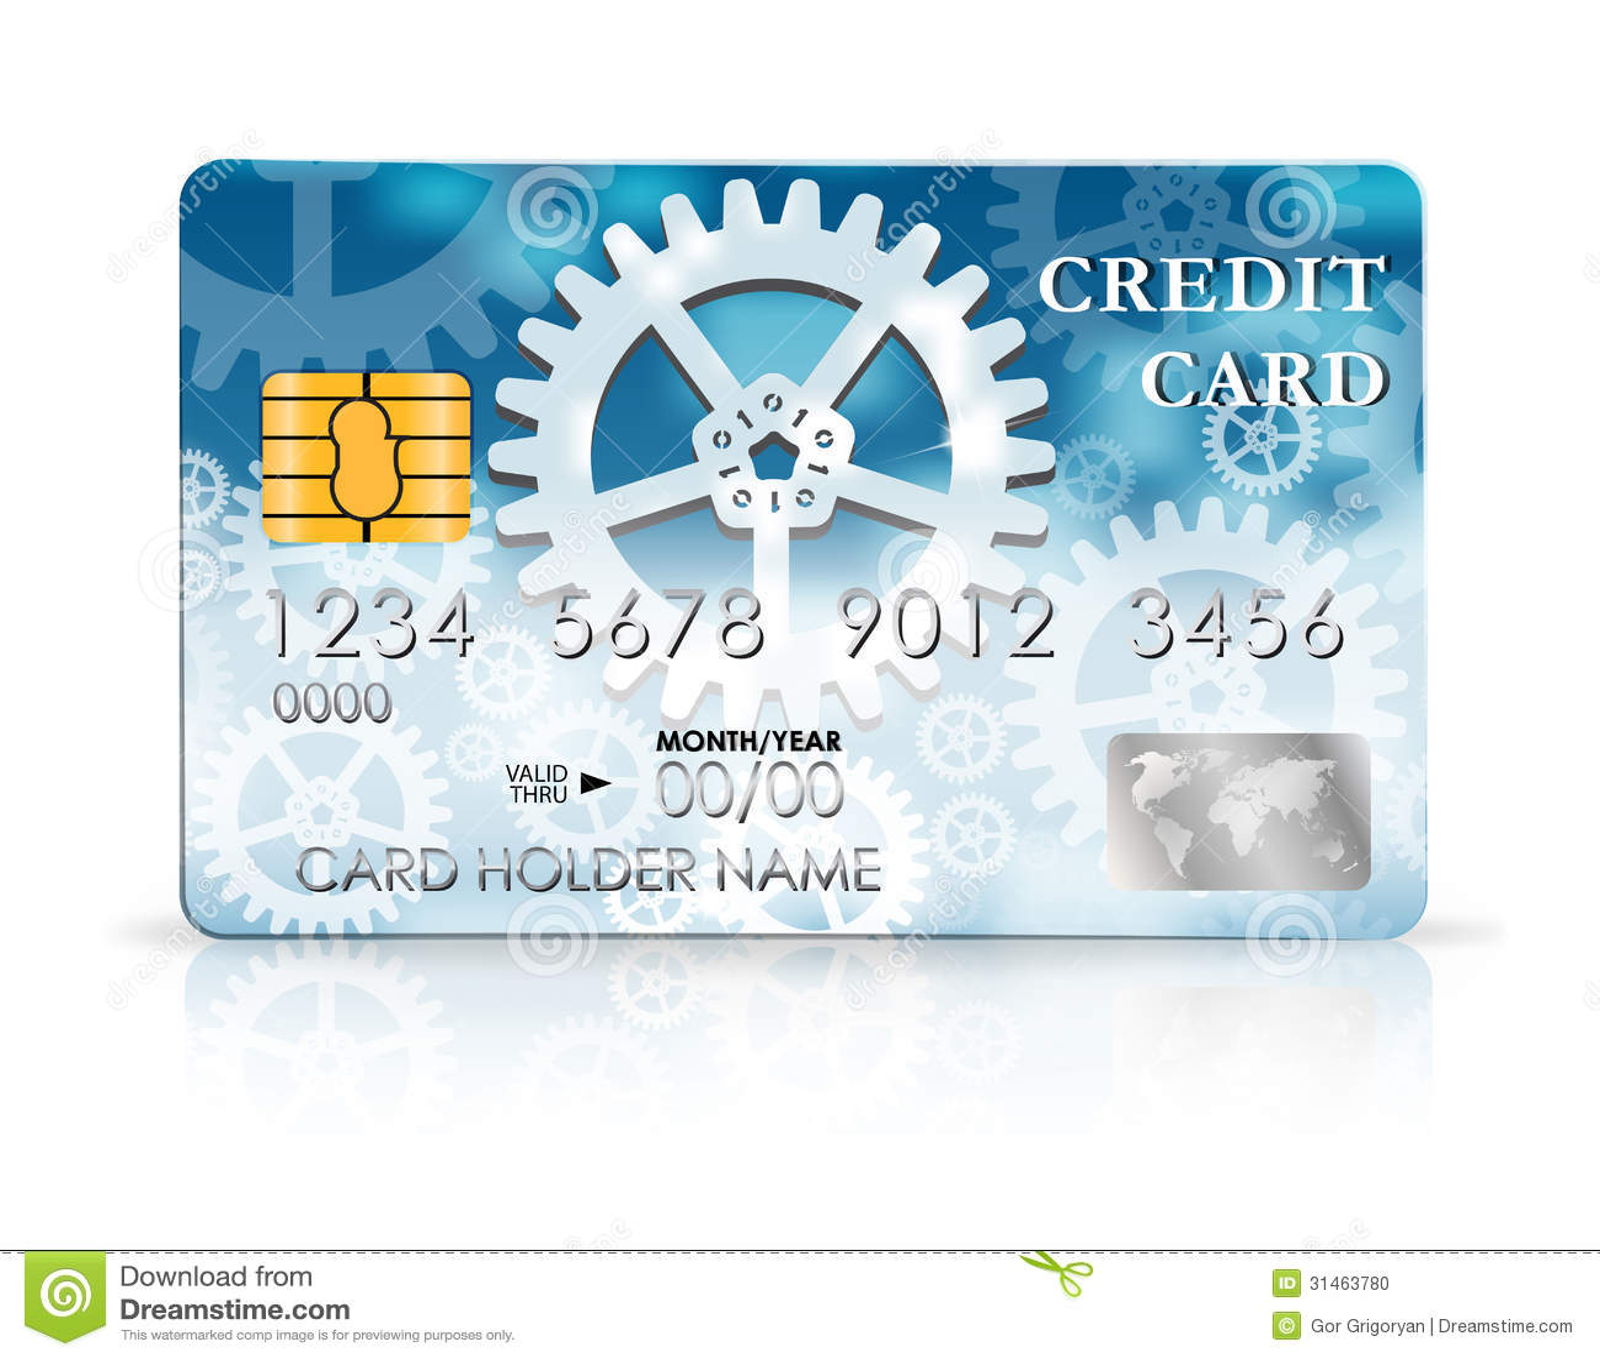 Credit Card Design Template Stock Vector